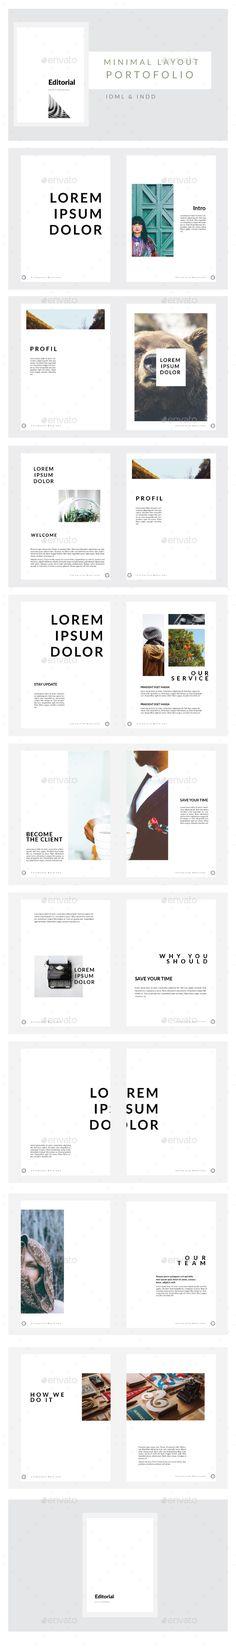 Minimal Portofolio Layout Multipurpose  — InDesign Template #booklet #customizable • Download ➝ https://graphicriver.net/item/minimal-portofolio-layout-multipurpose/15926373?ref=pxcr